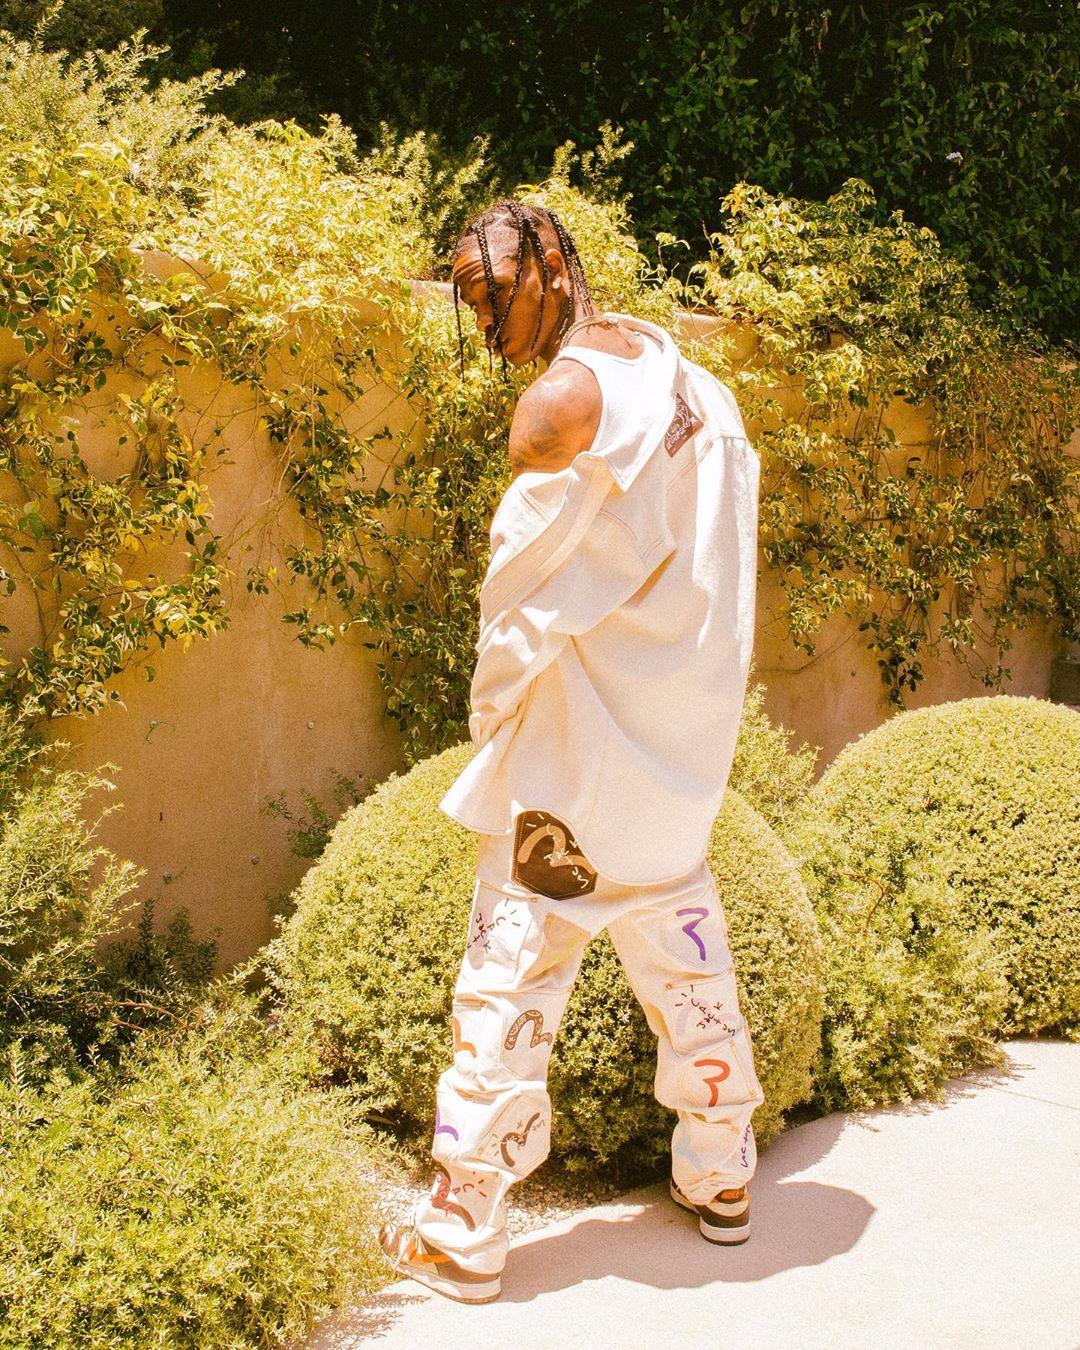 Pantaloni in Jeans Bianco Travis Scott x EVISU Cactus Jack